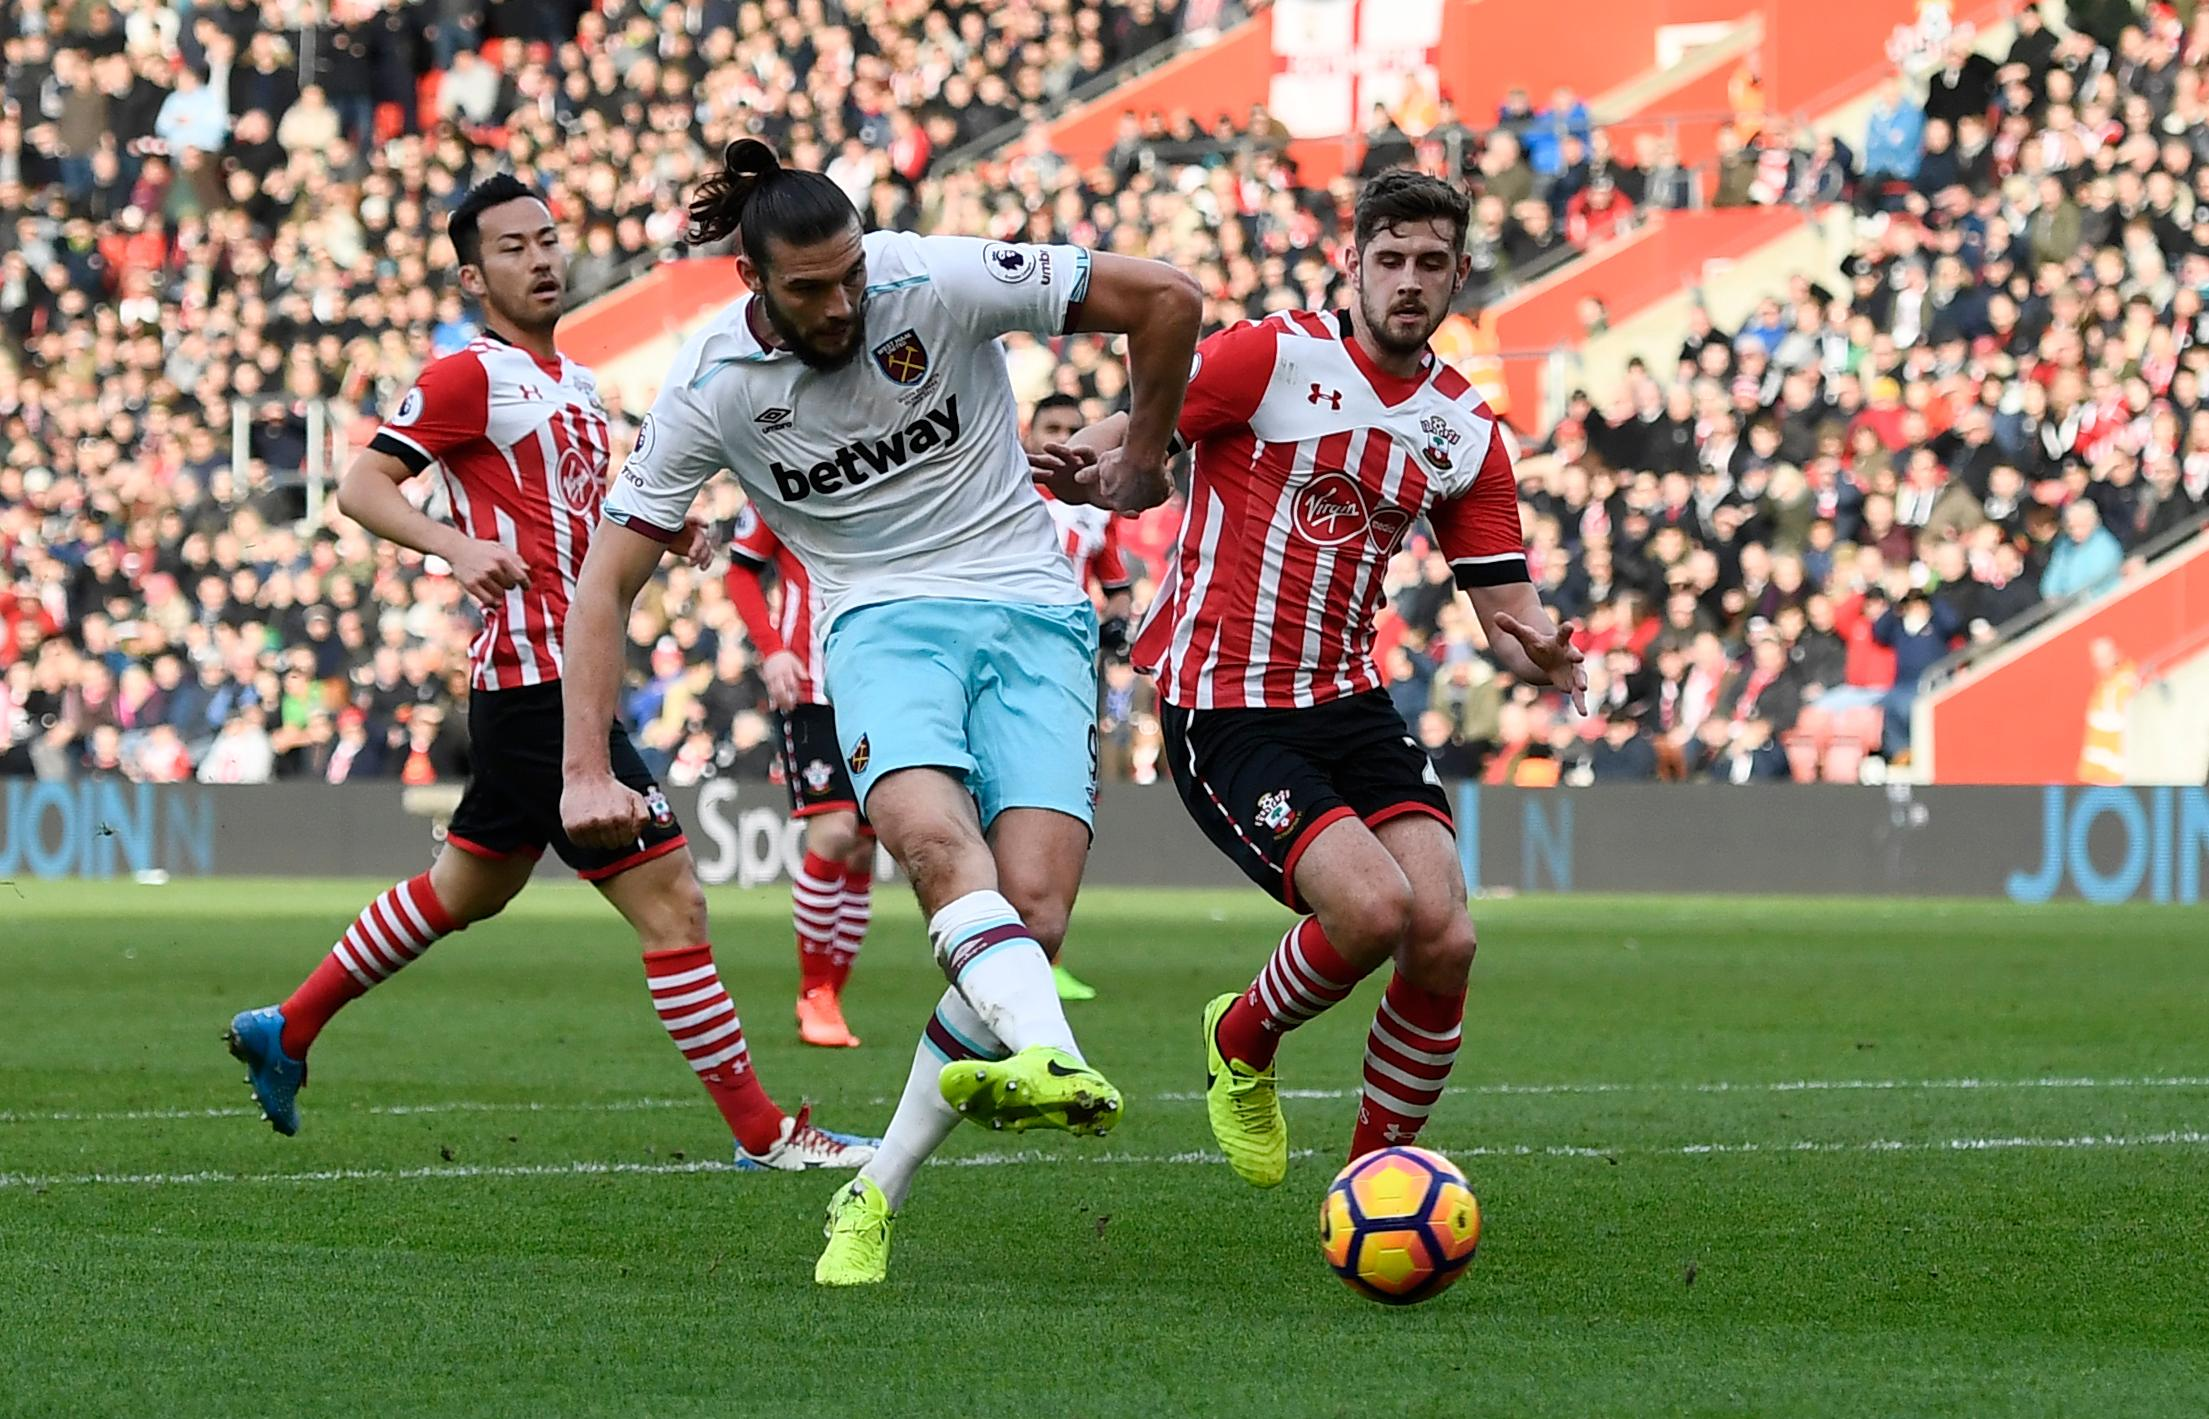 Southampton vs West Ham United prediction